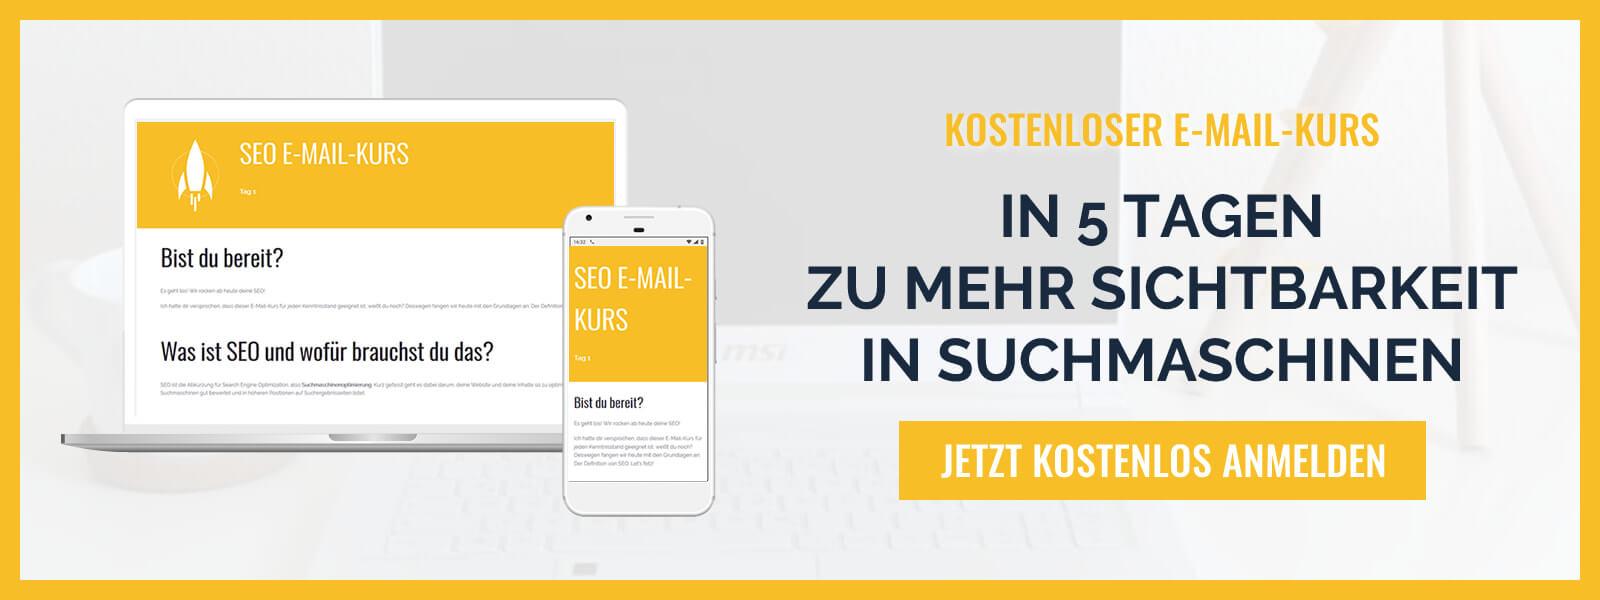 Steige frustfrei in SEO ein! Melde dich zum kostenlosen SEO E-Mail-Kurs an. | Blogger-Coaching.de - Tipps & Kurse für Blogger